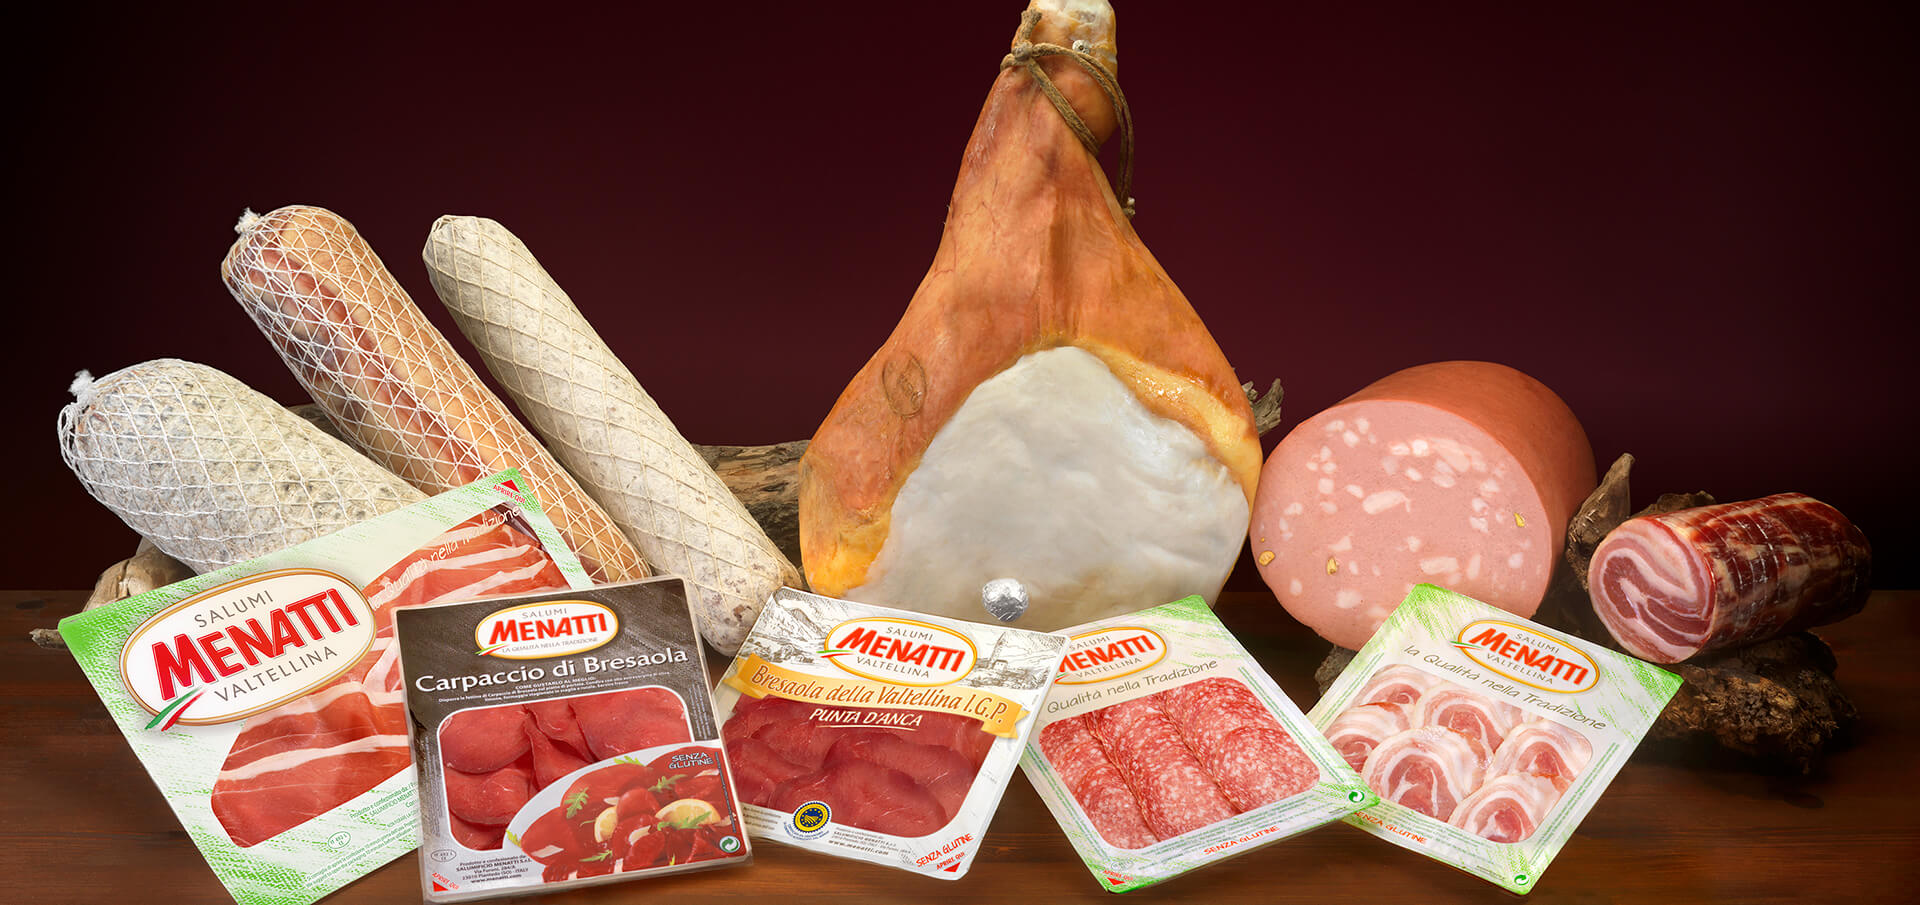 Affettati italiani tradizionali